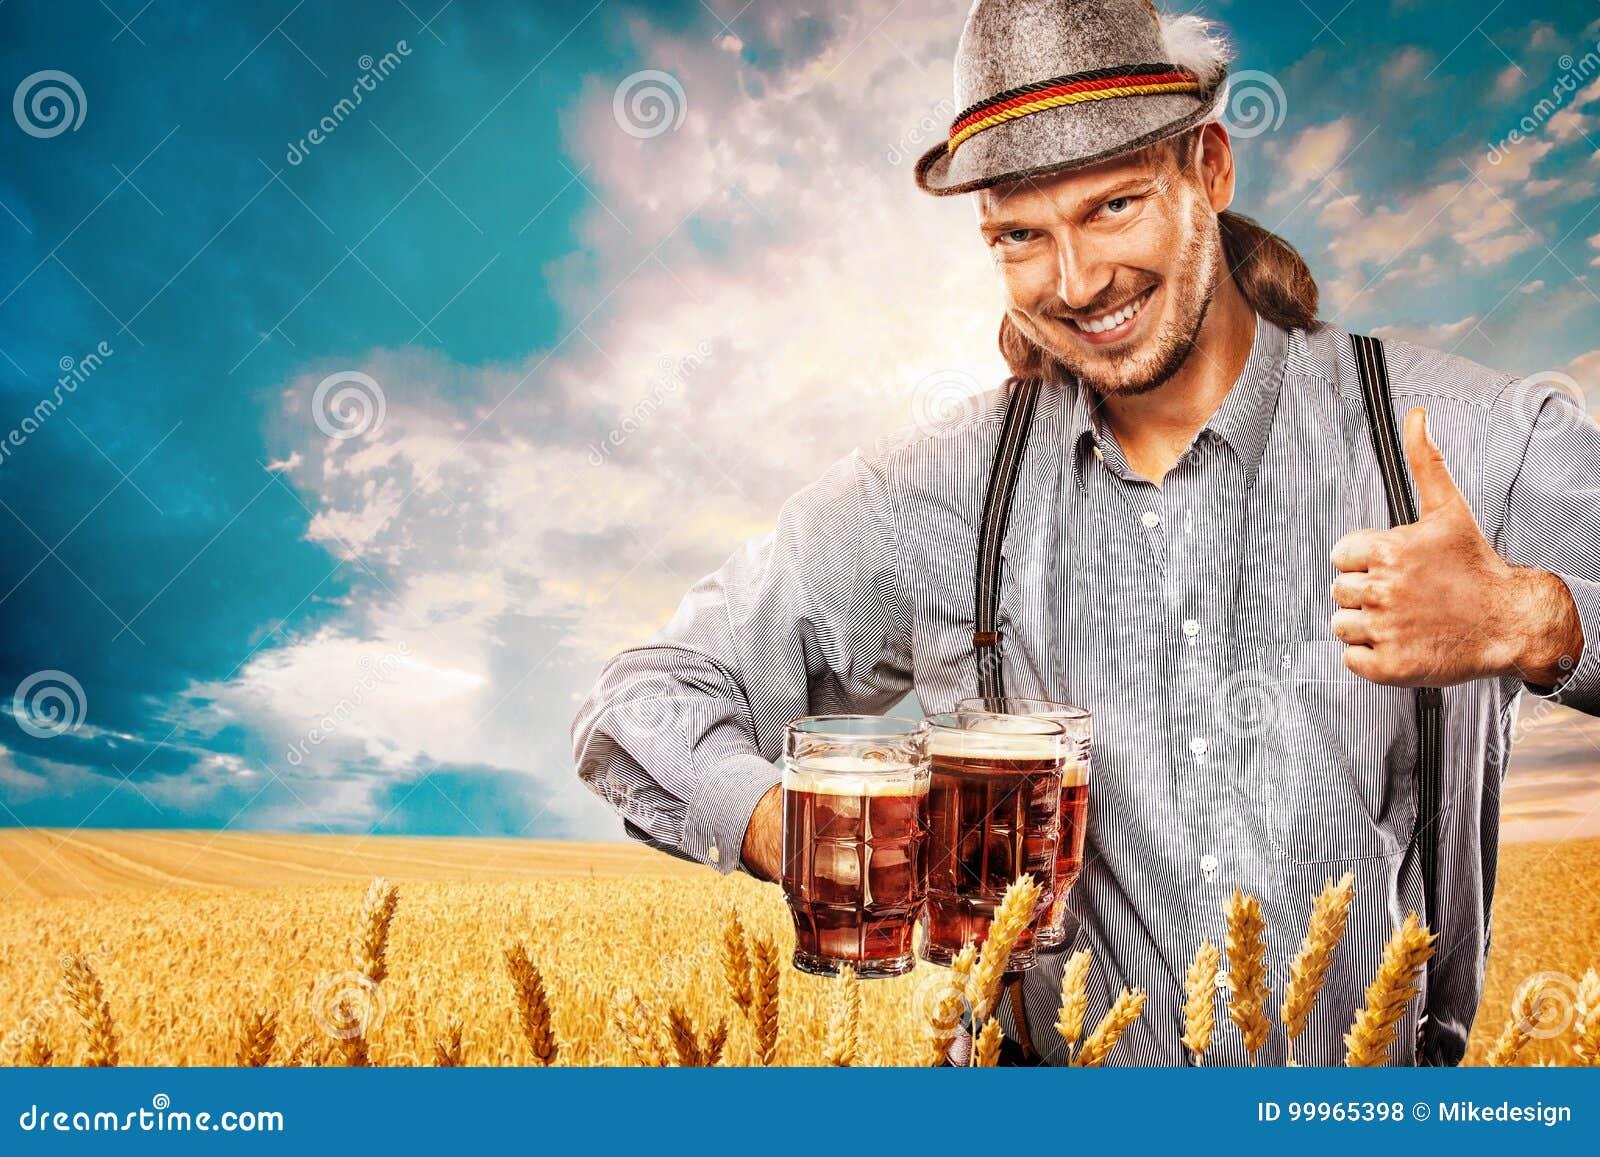 Portrait of Oktoberfest man, wearing a traditional Bavarian clothes, serving big beer mugs.